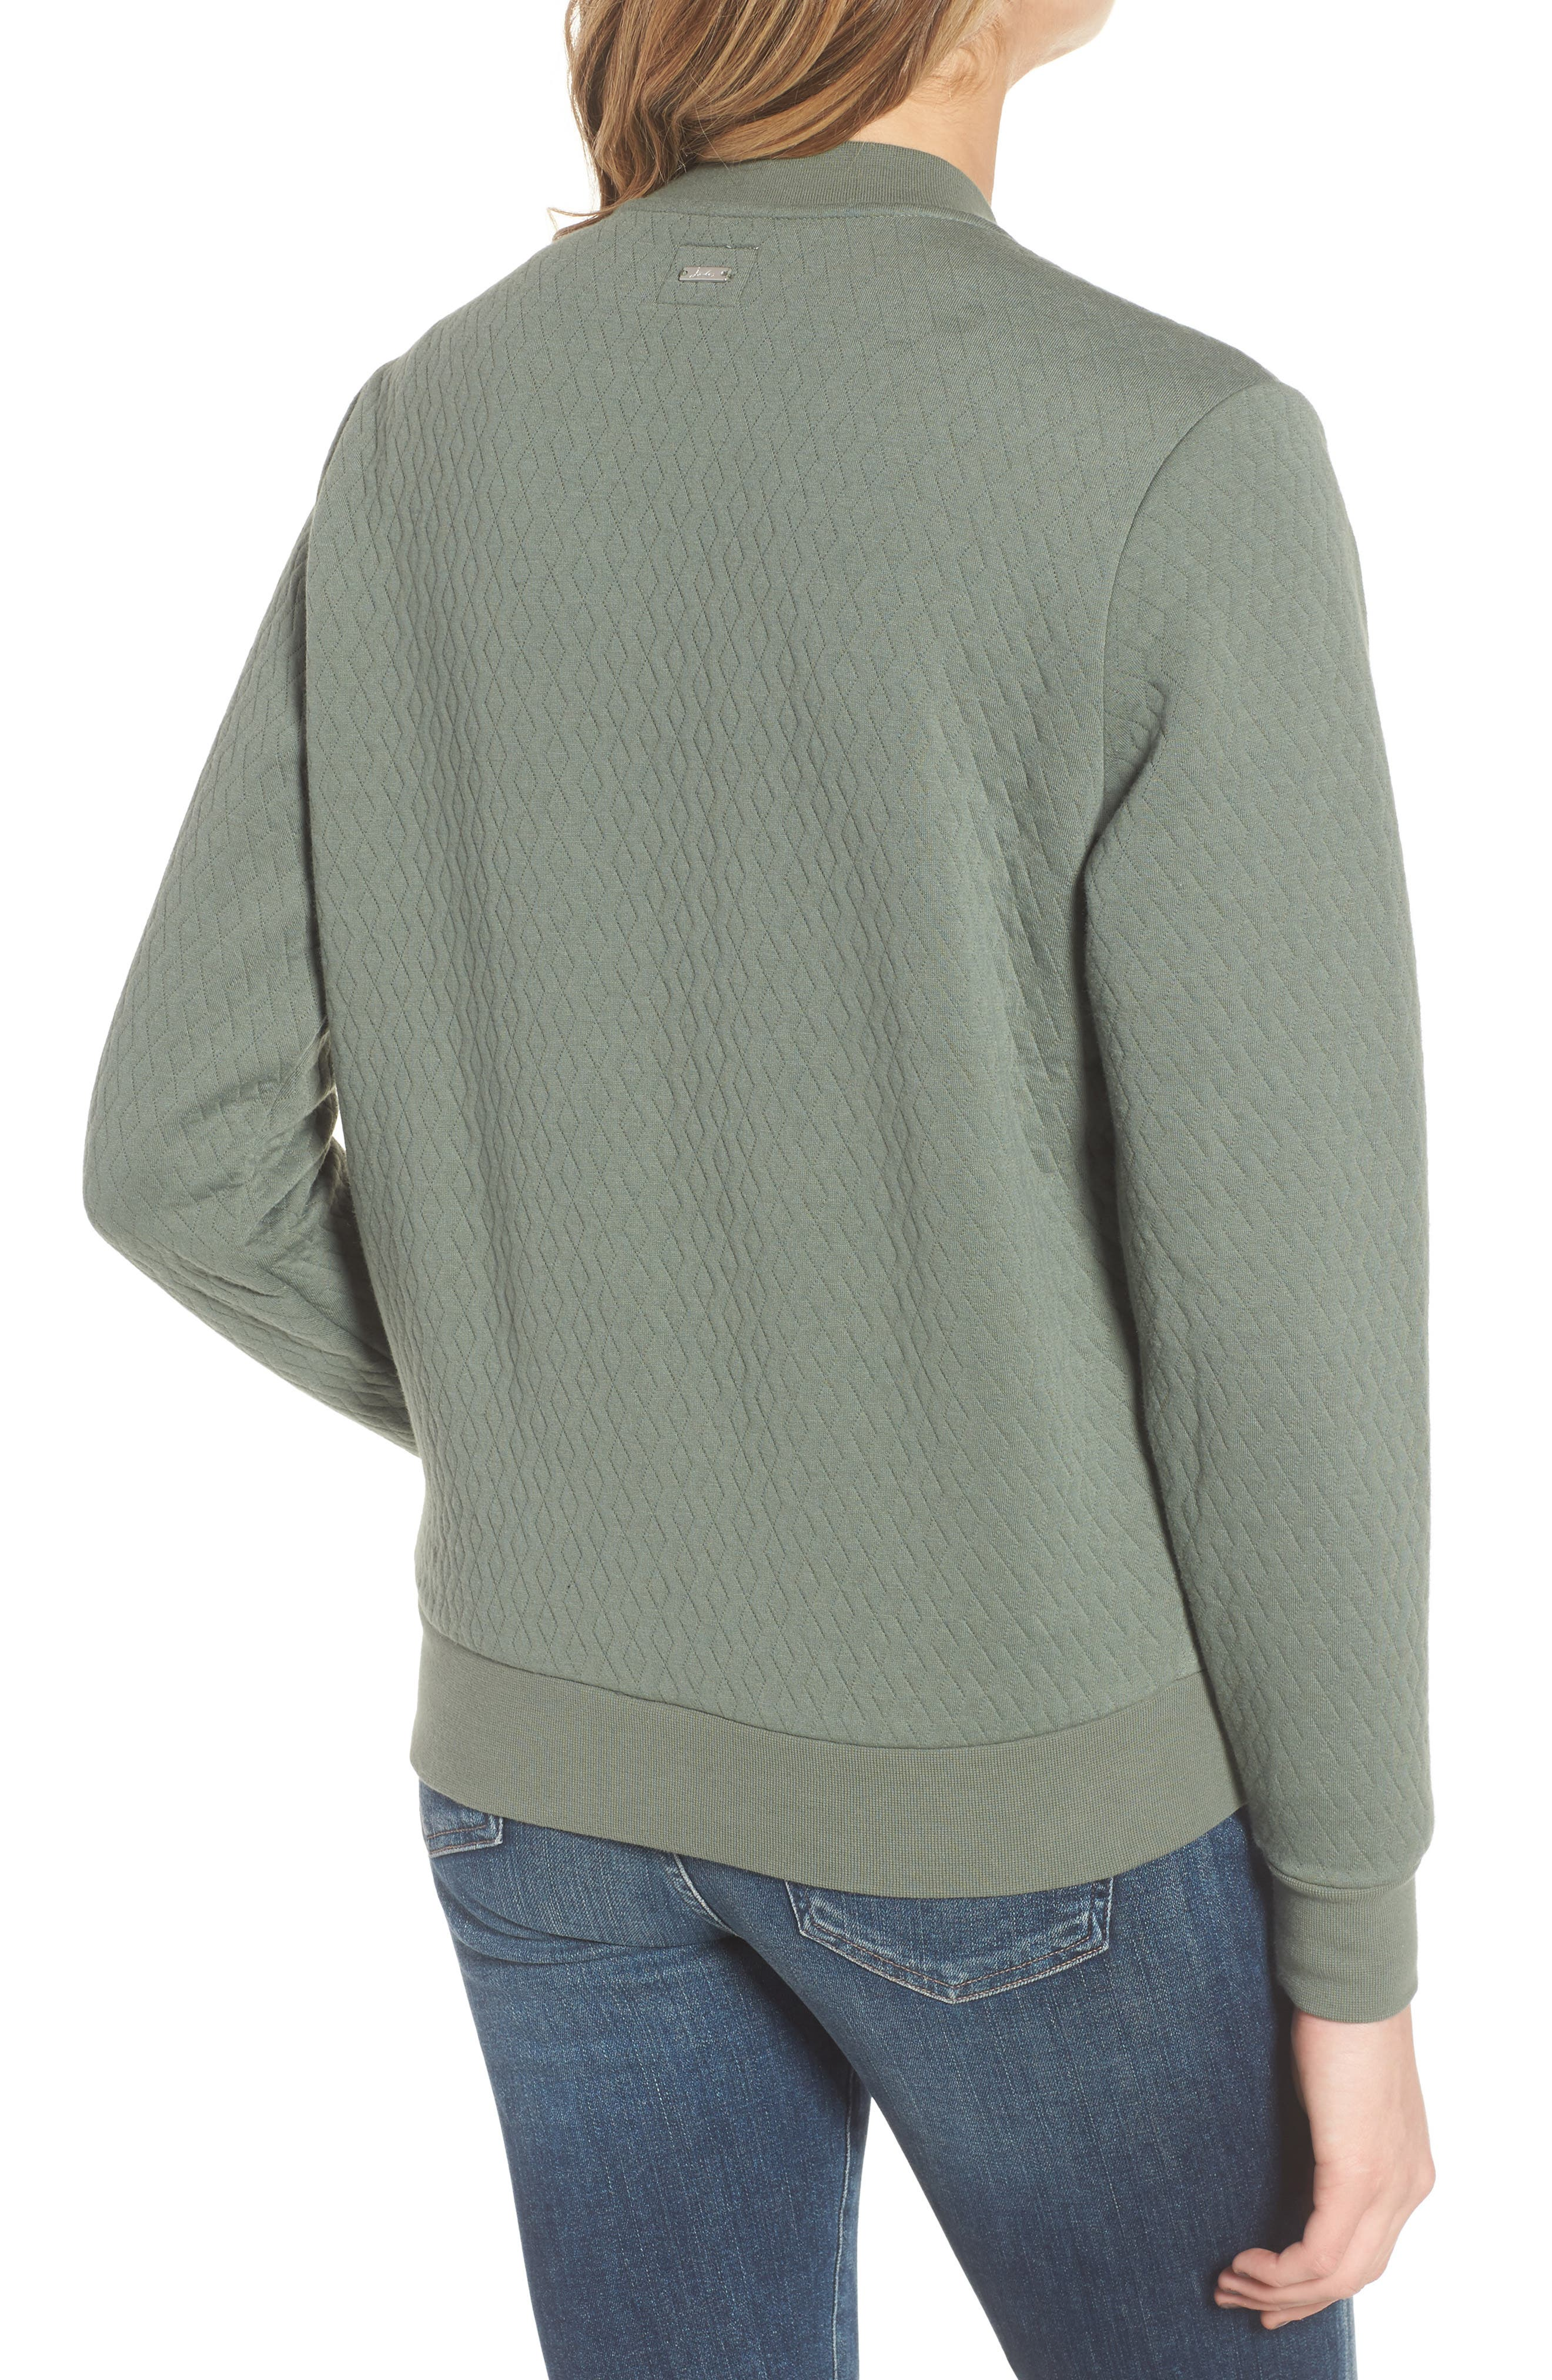 Millie Bomber Sweatshirt Jacket,                             Alternate thumbnail 2, color,                             301